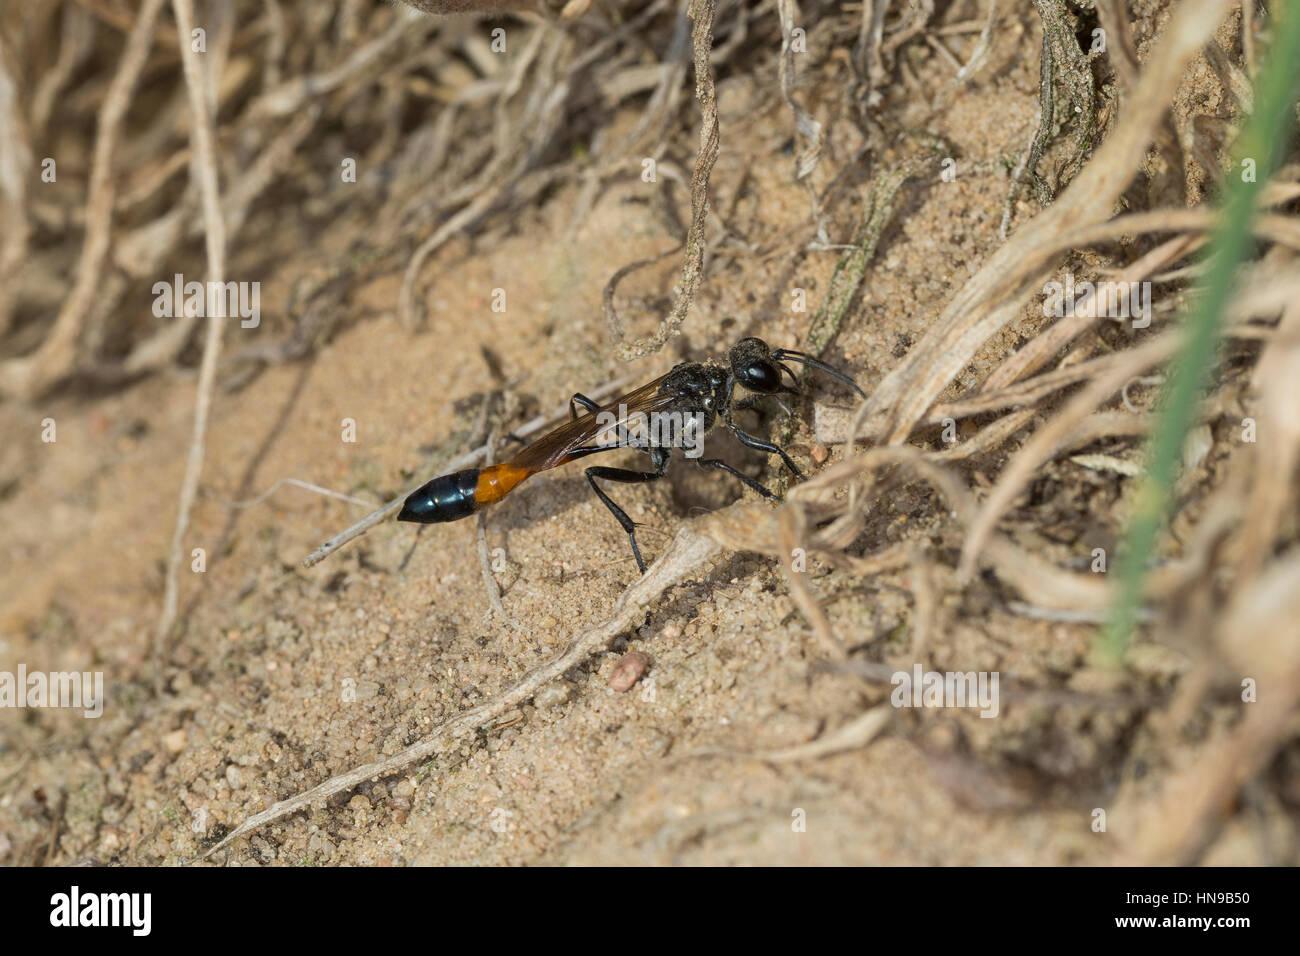 Gemeine Sandwespe, Weibchen, Ammophila sabulosa, Red-banded Sand Wasp, sand digger wasp, female, Grabwespe - Stock Image